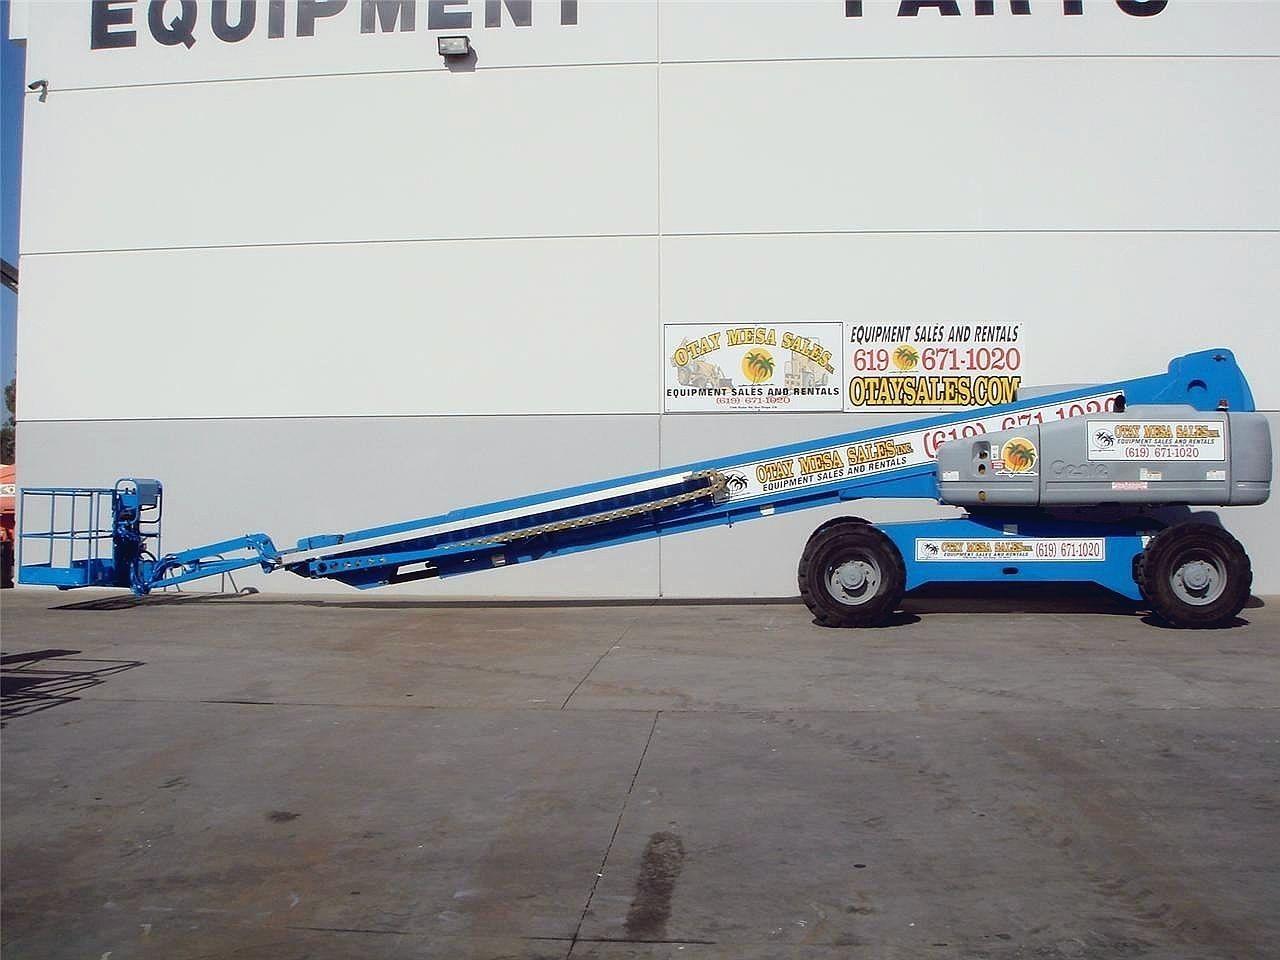 2007 Genie S125 Telehandler